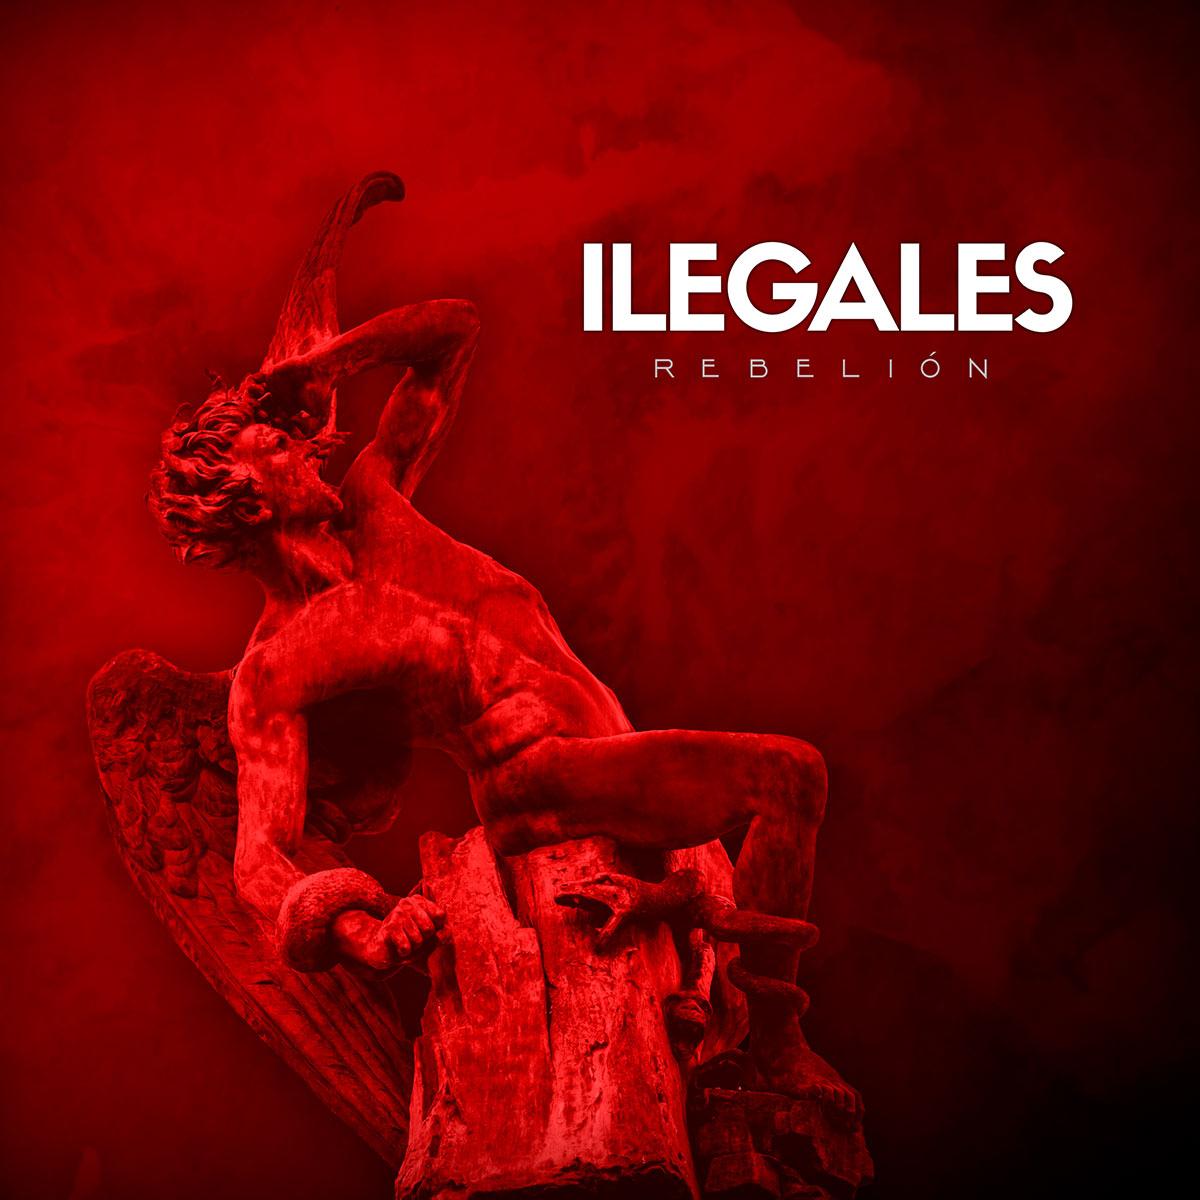 Ilegales Rebelion